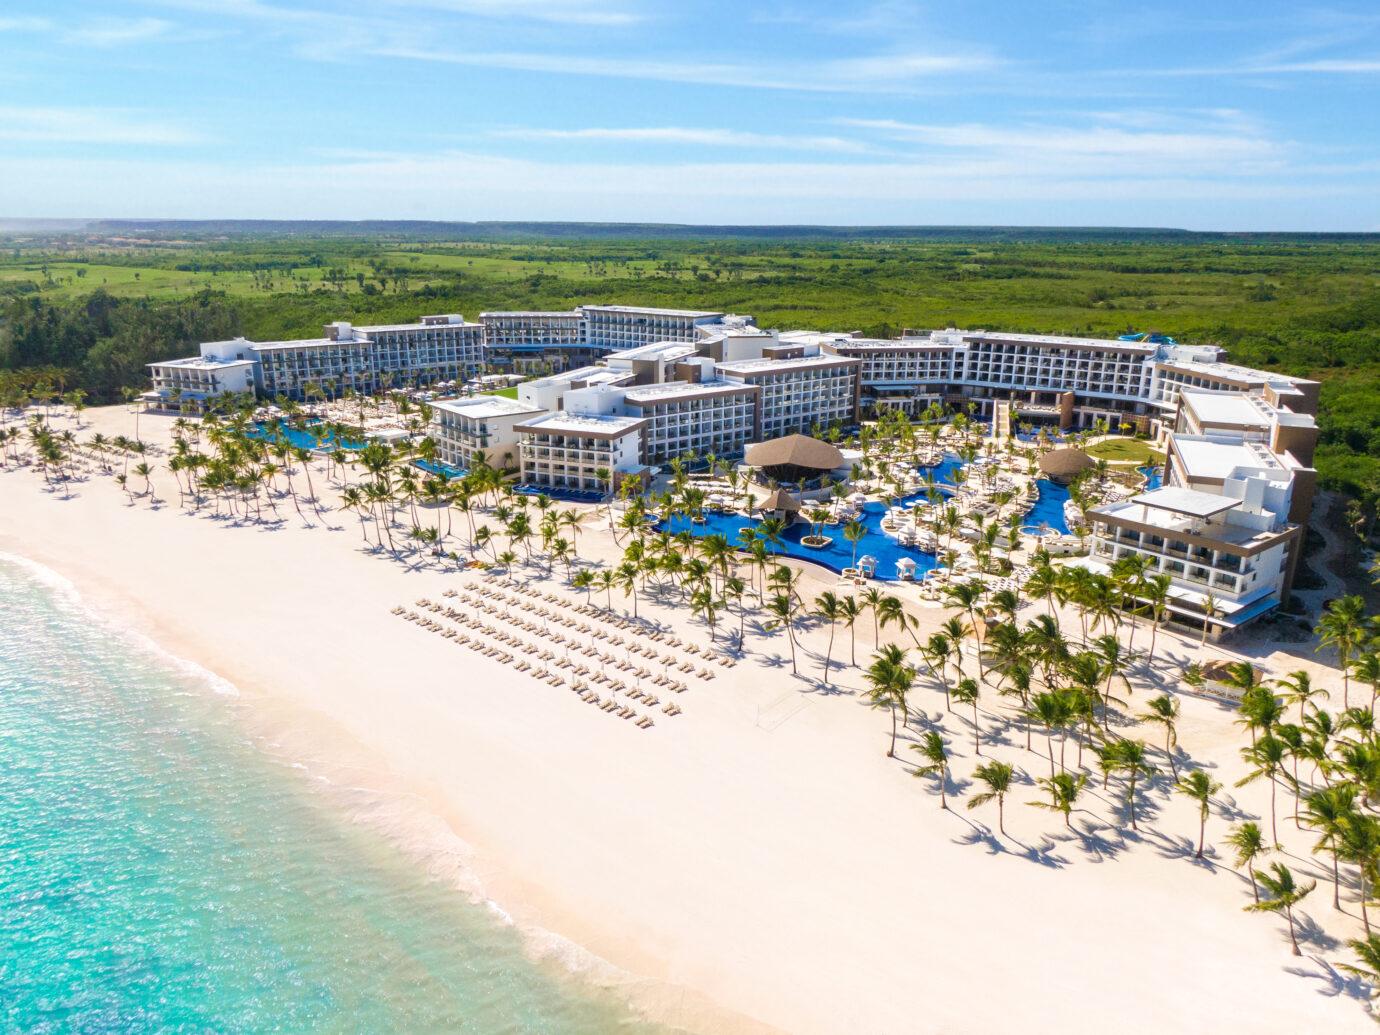 Hyatt Ziva and Zilara Cap Cana Resorts